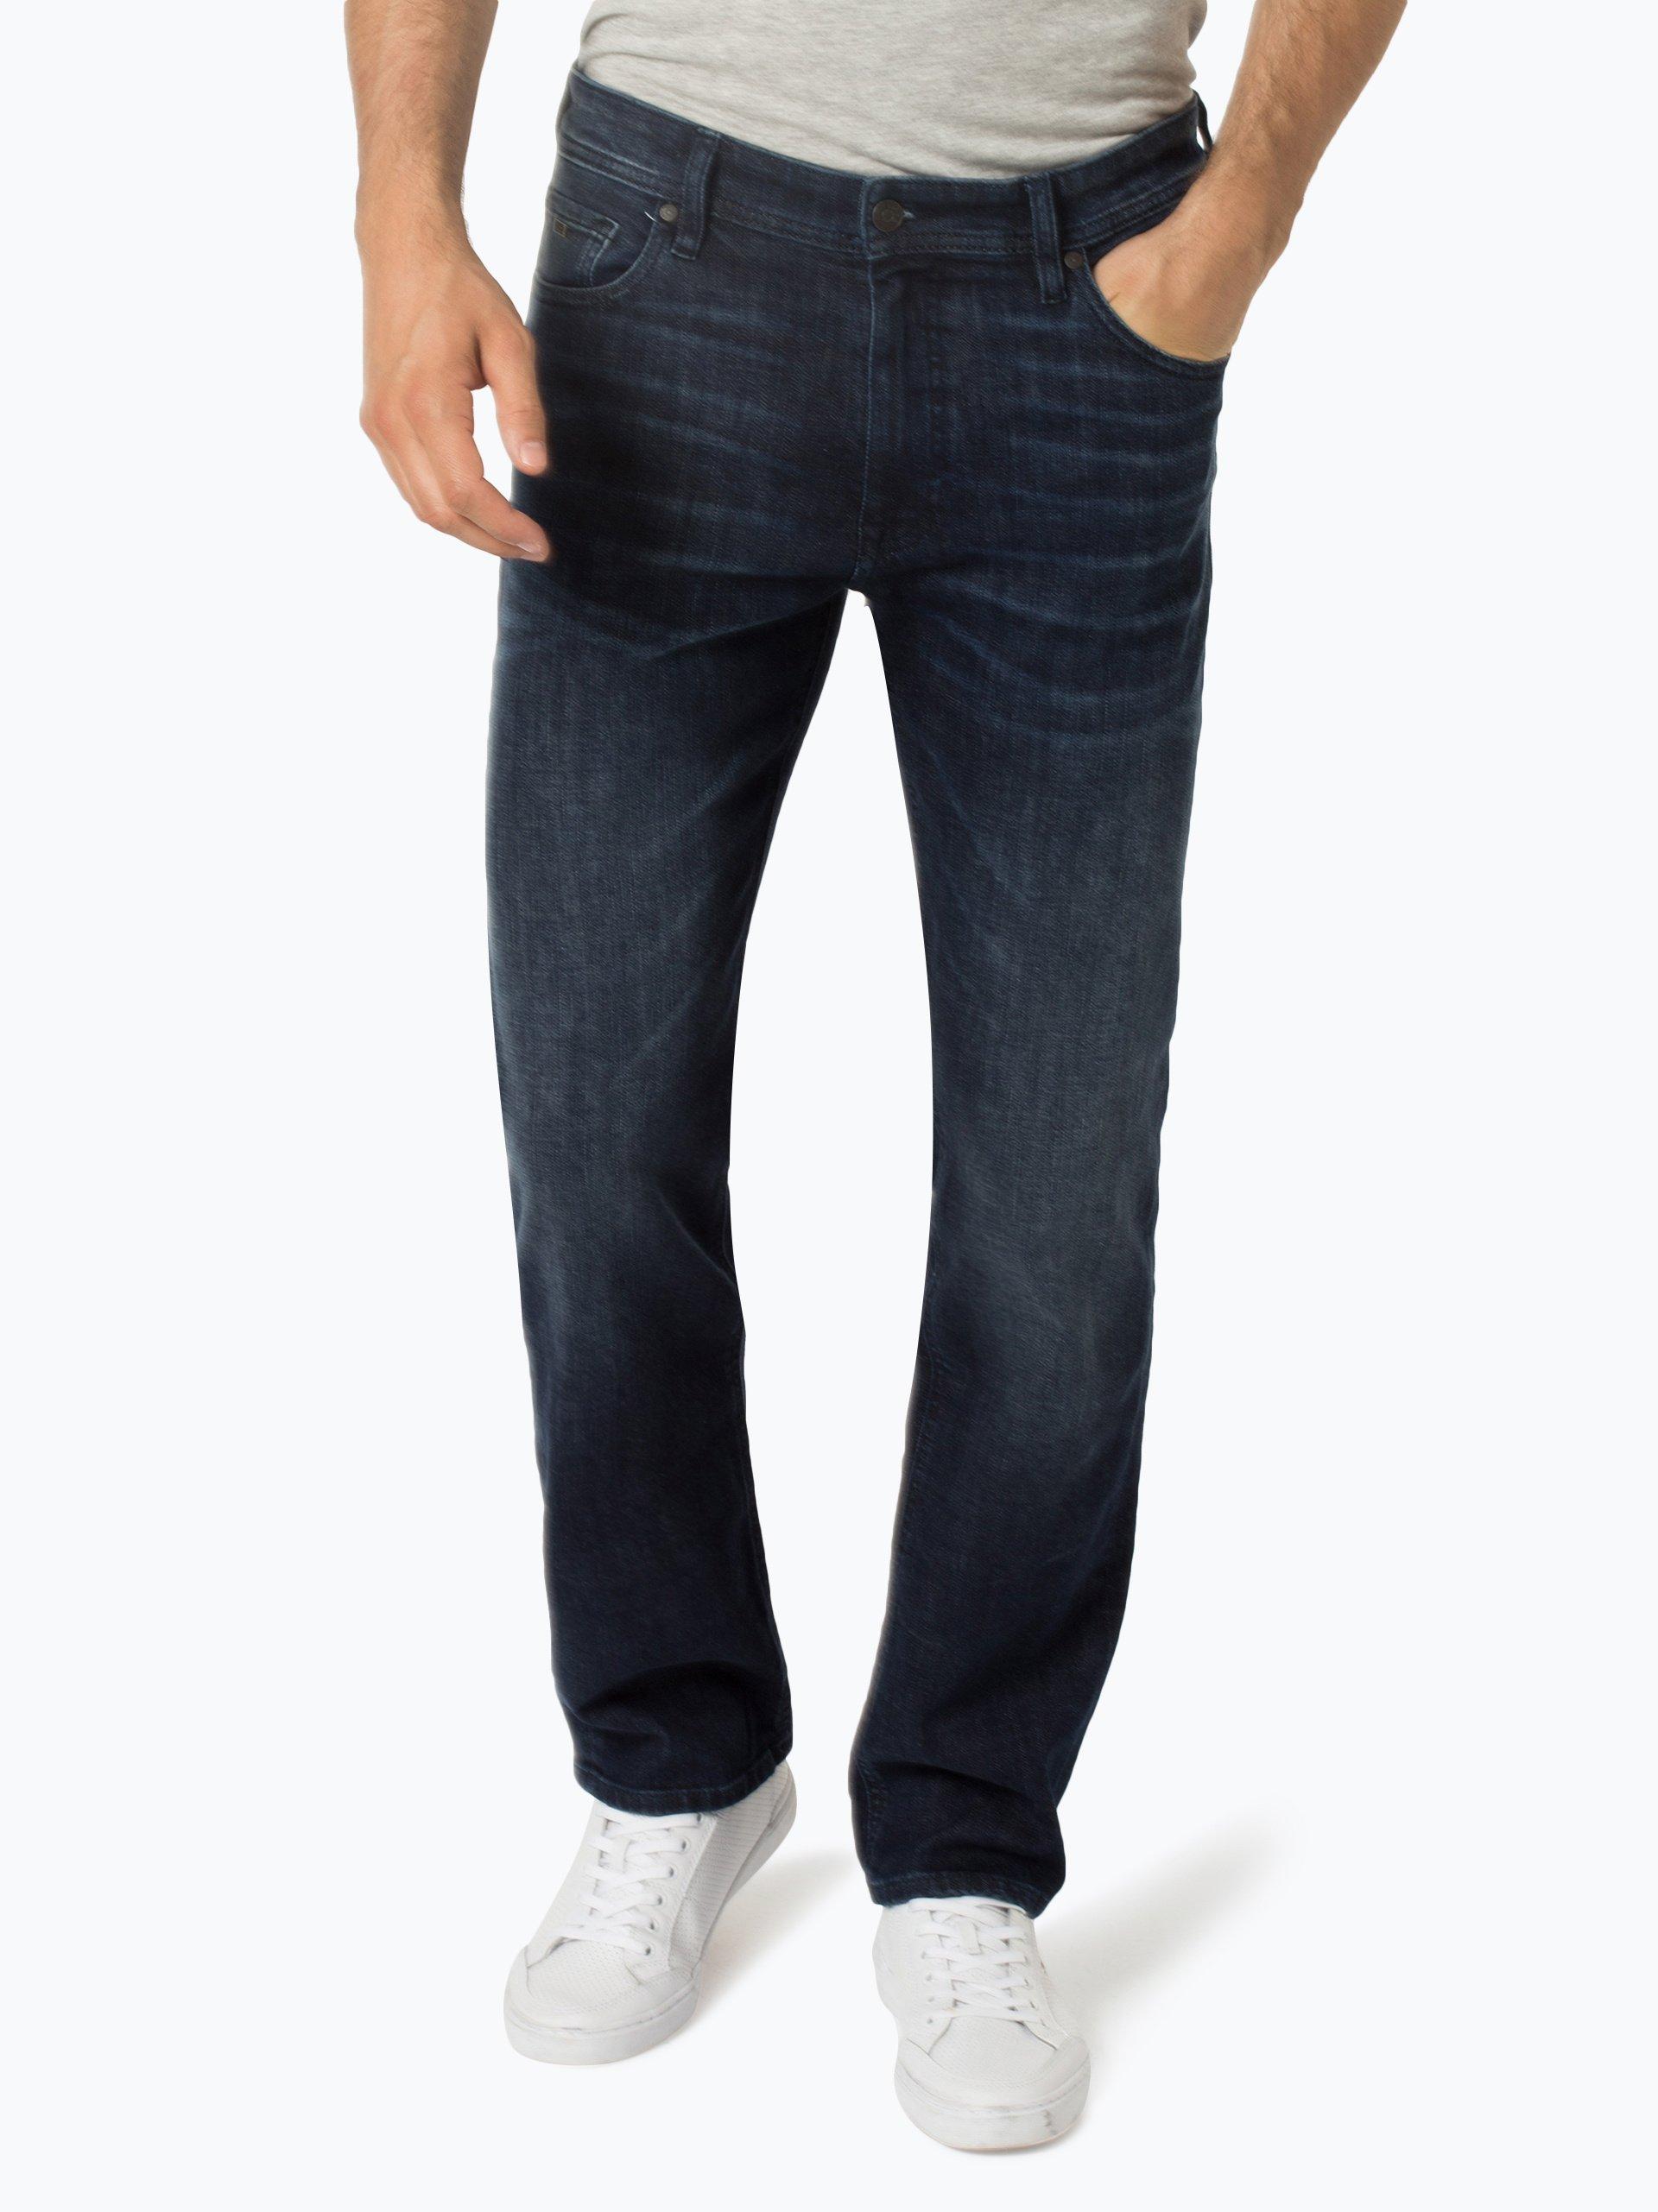 BOSS Casual Herren Jeans - Albany